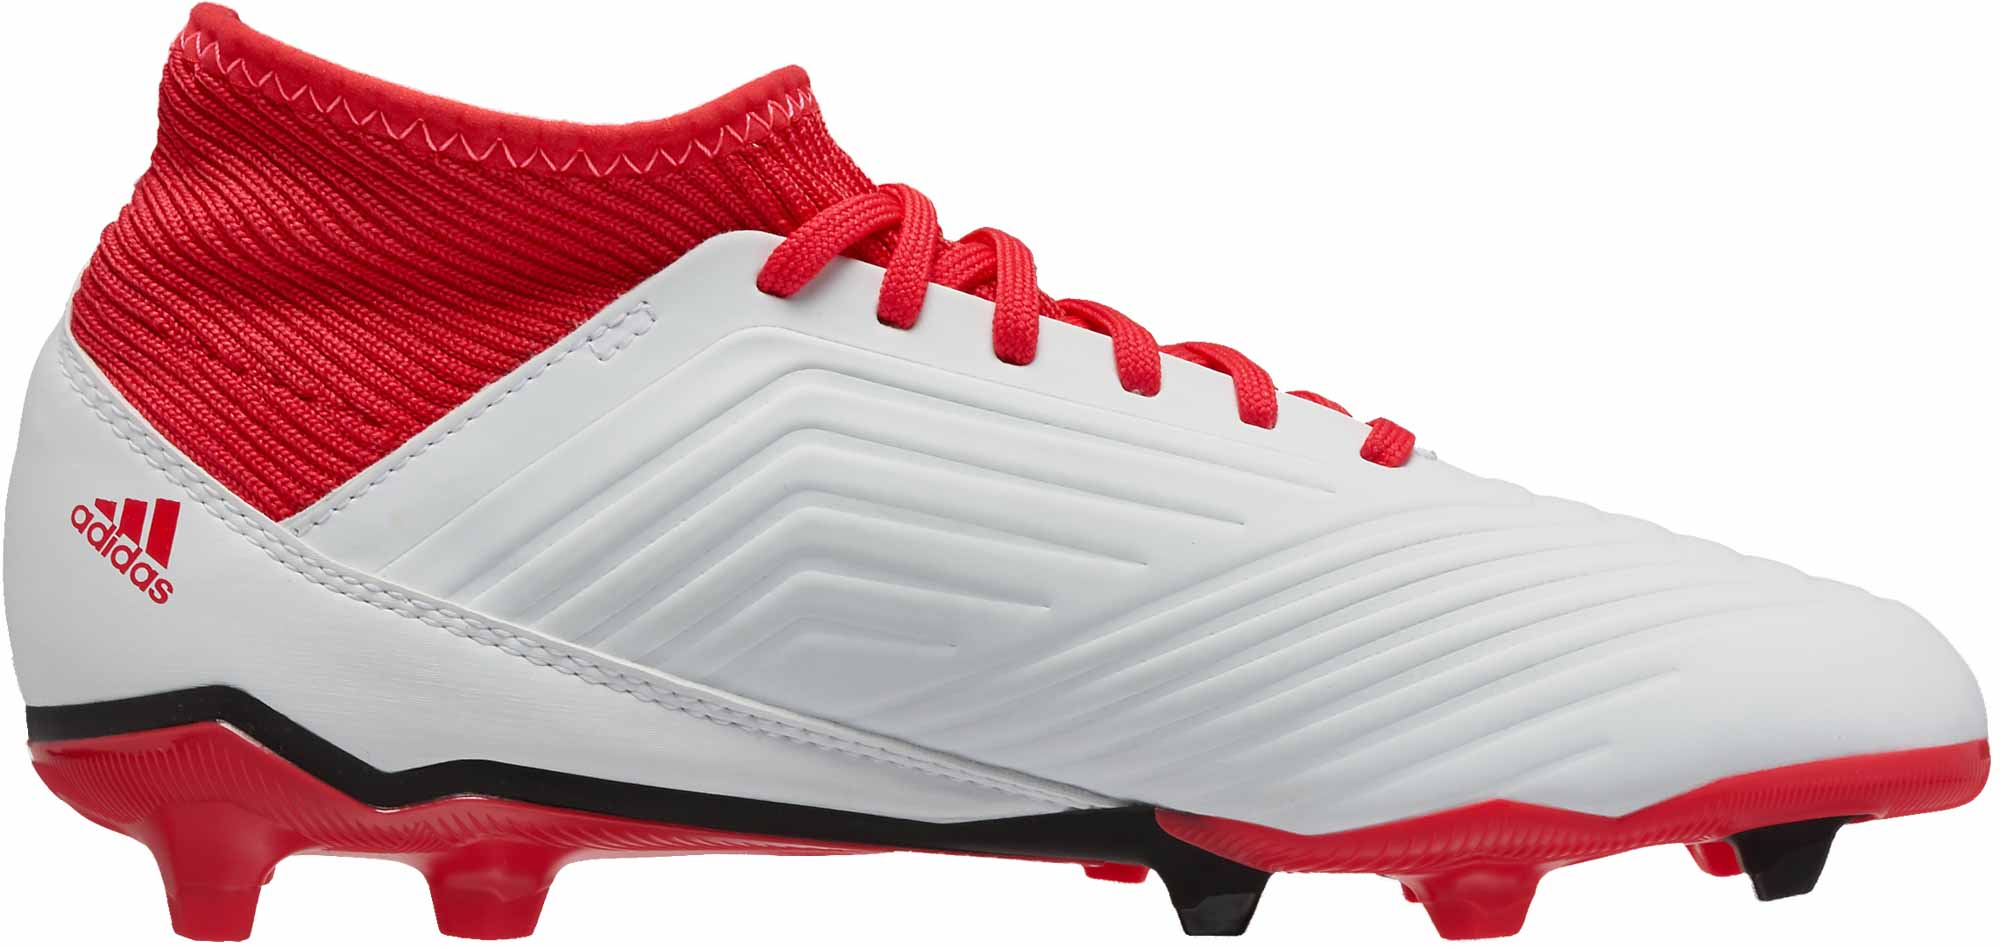 e3718178f0e adidas Kids Predator 18.3 FG - White   Real Coral - Soccer Master